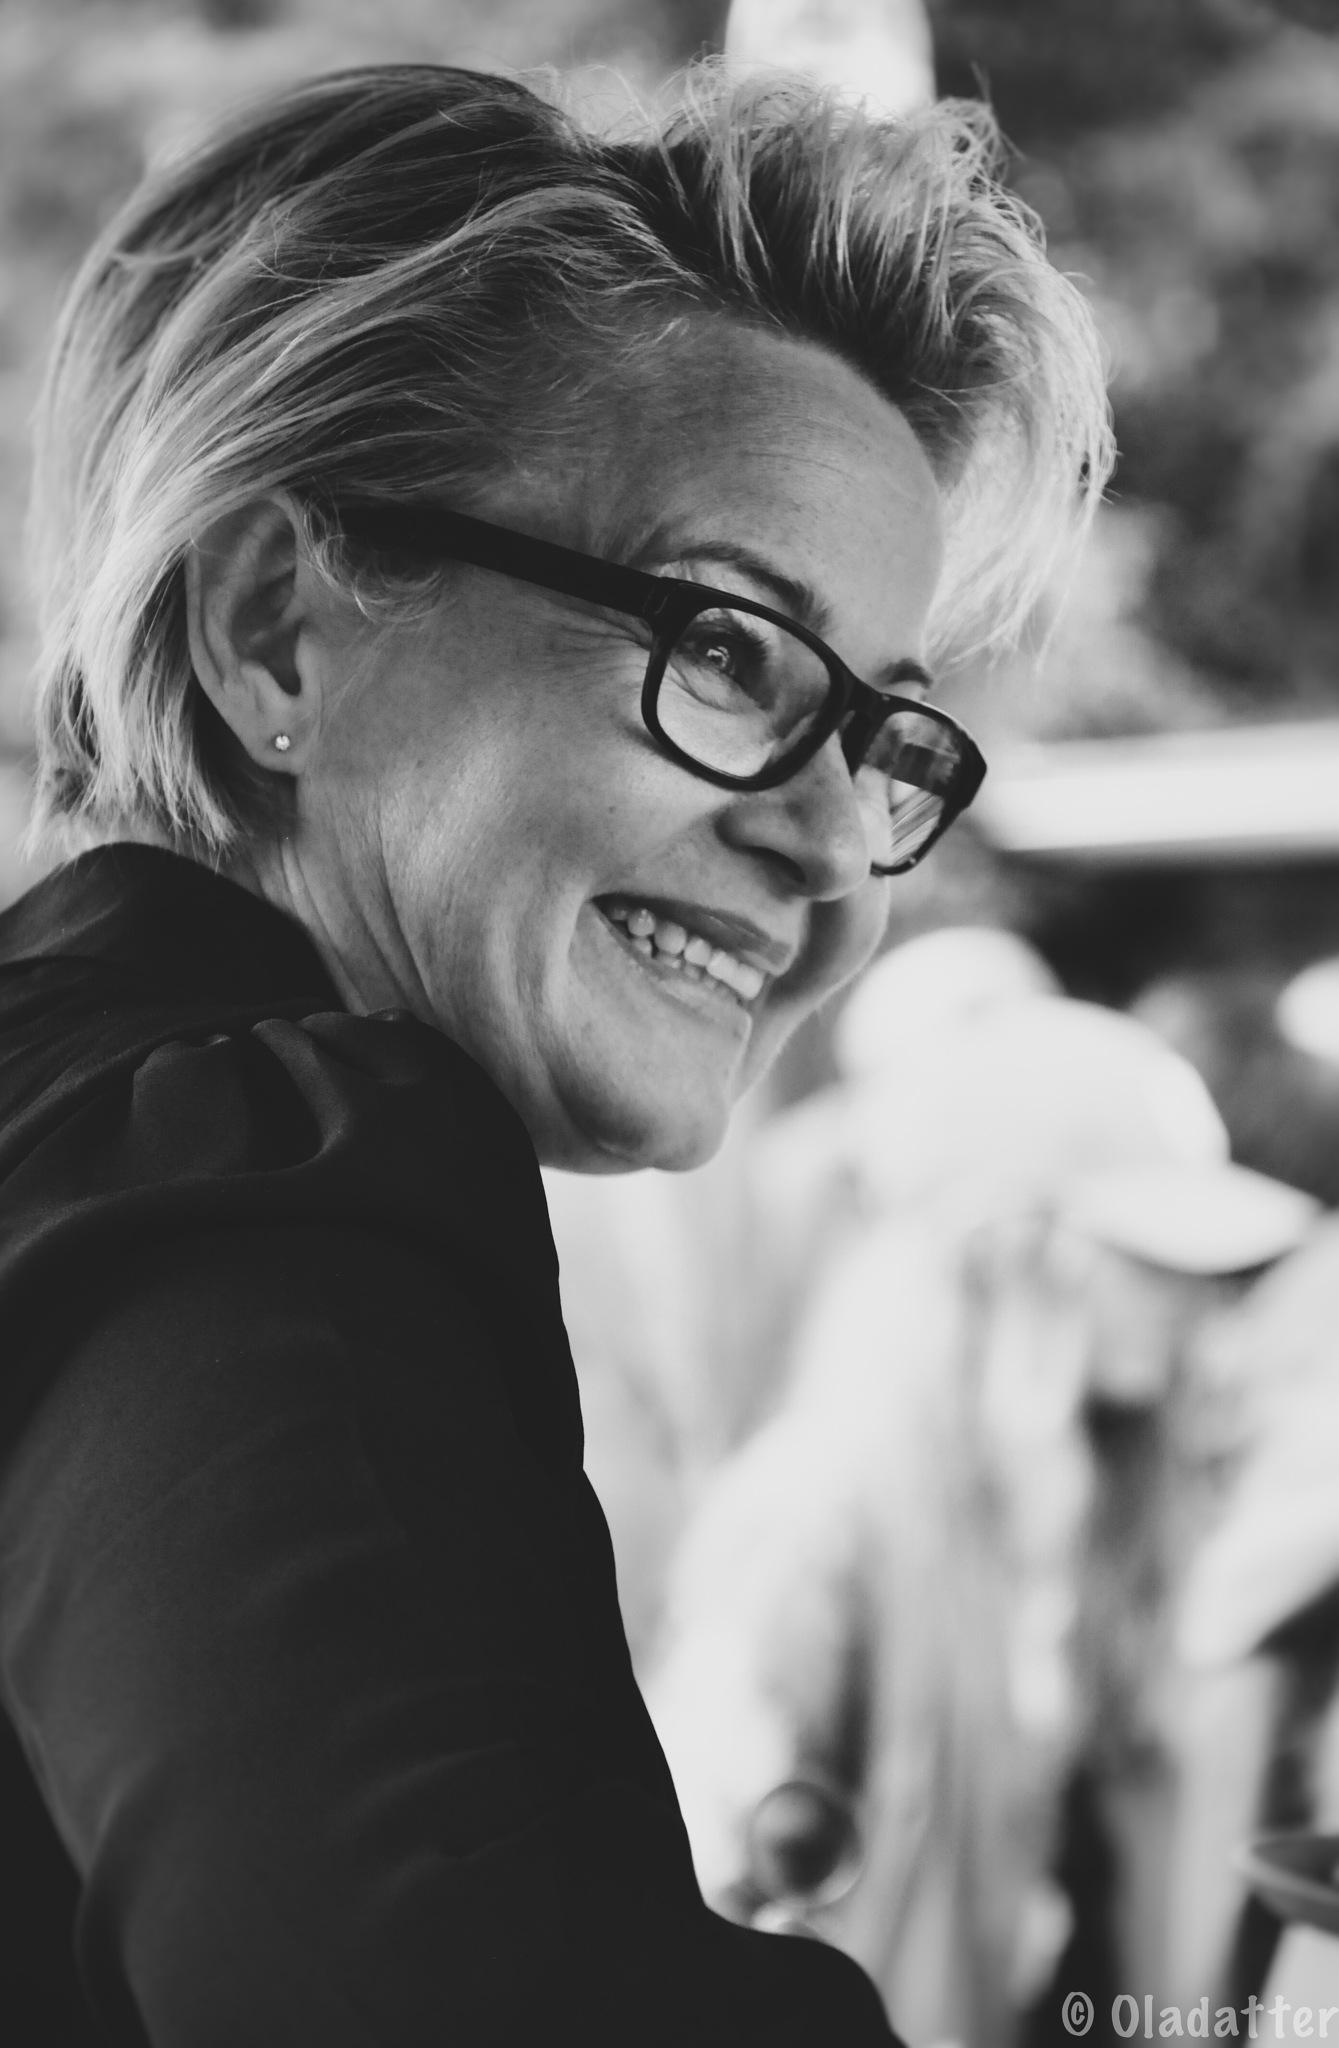 A study of joy by Kristin Oladatter